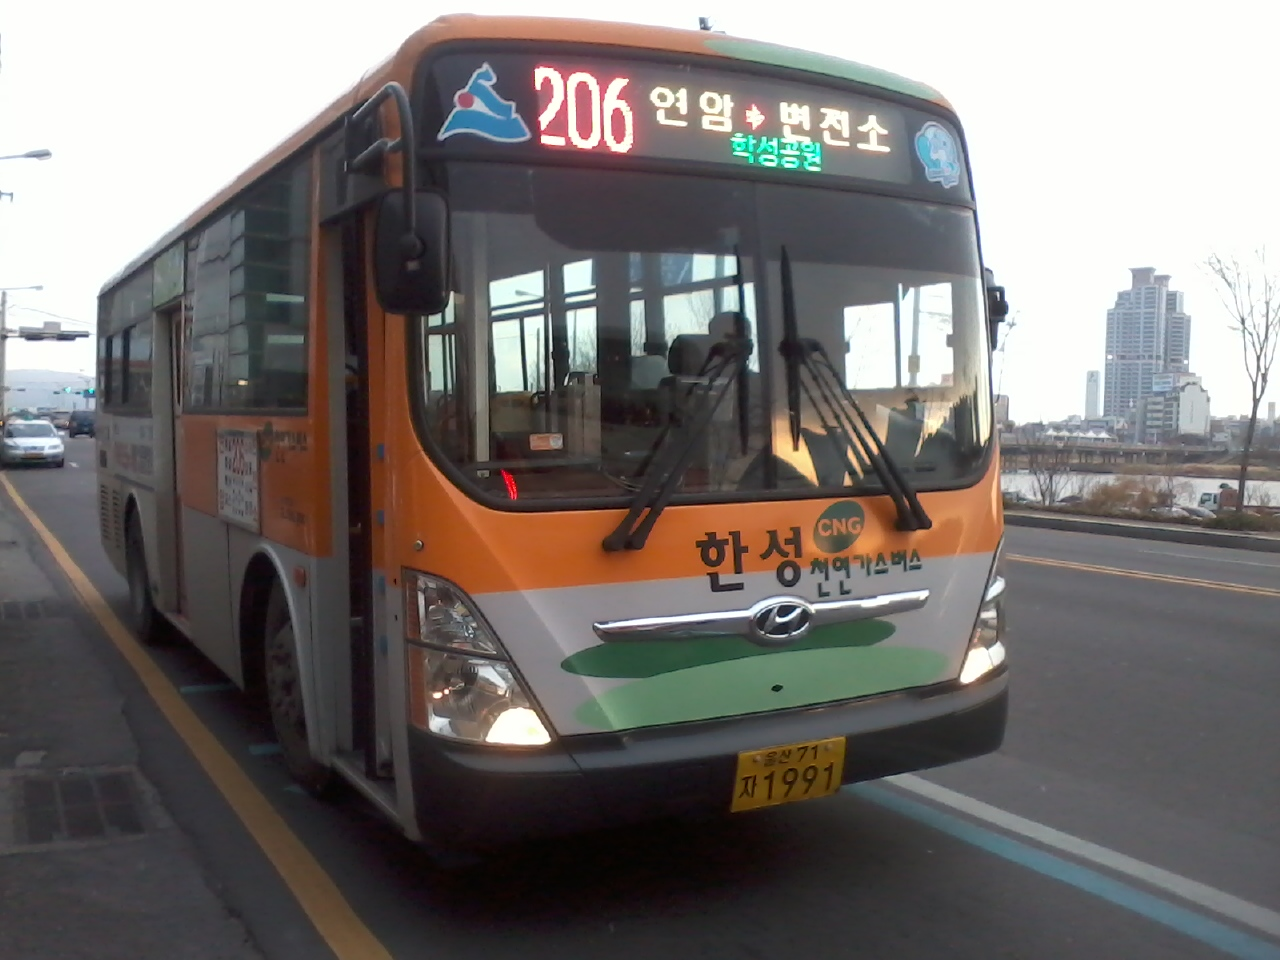 gba bus 206 2014 jan